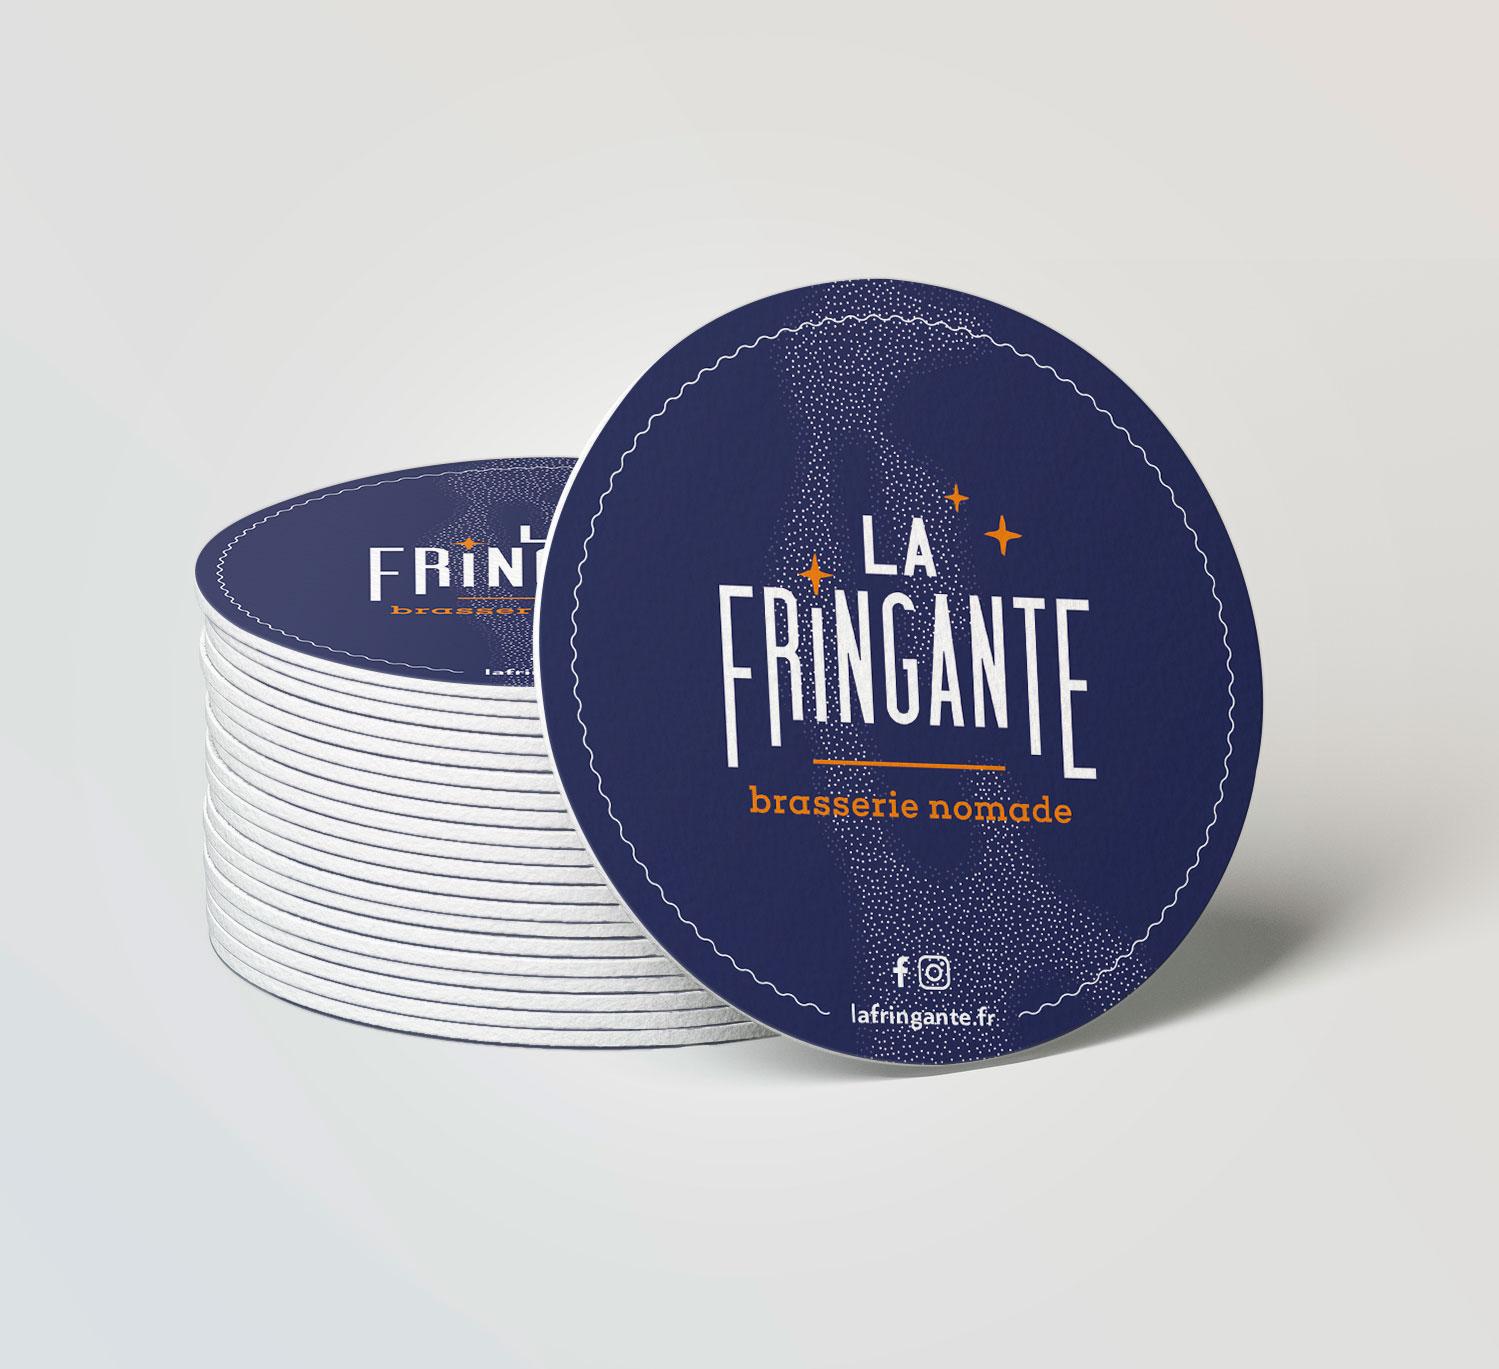 FRINGANTE_sousbock